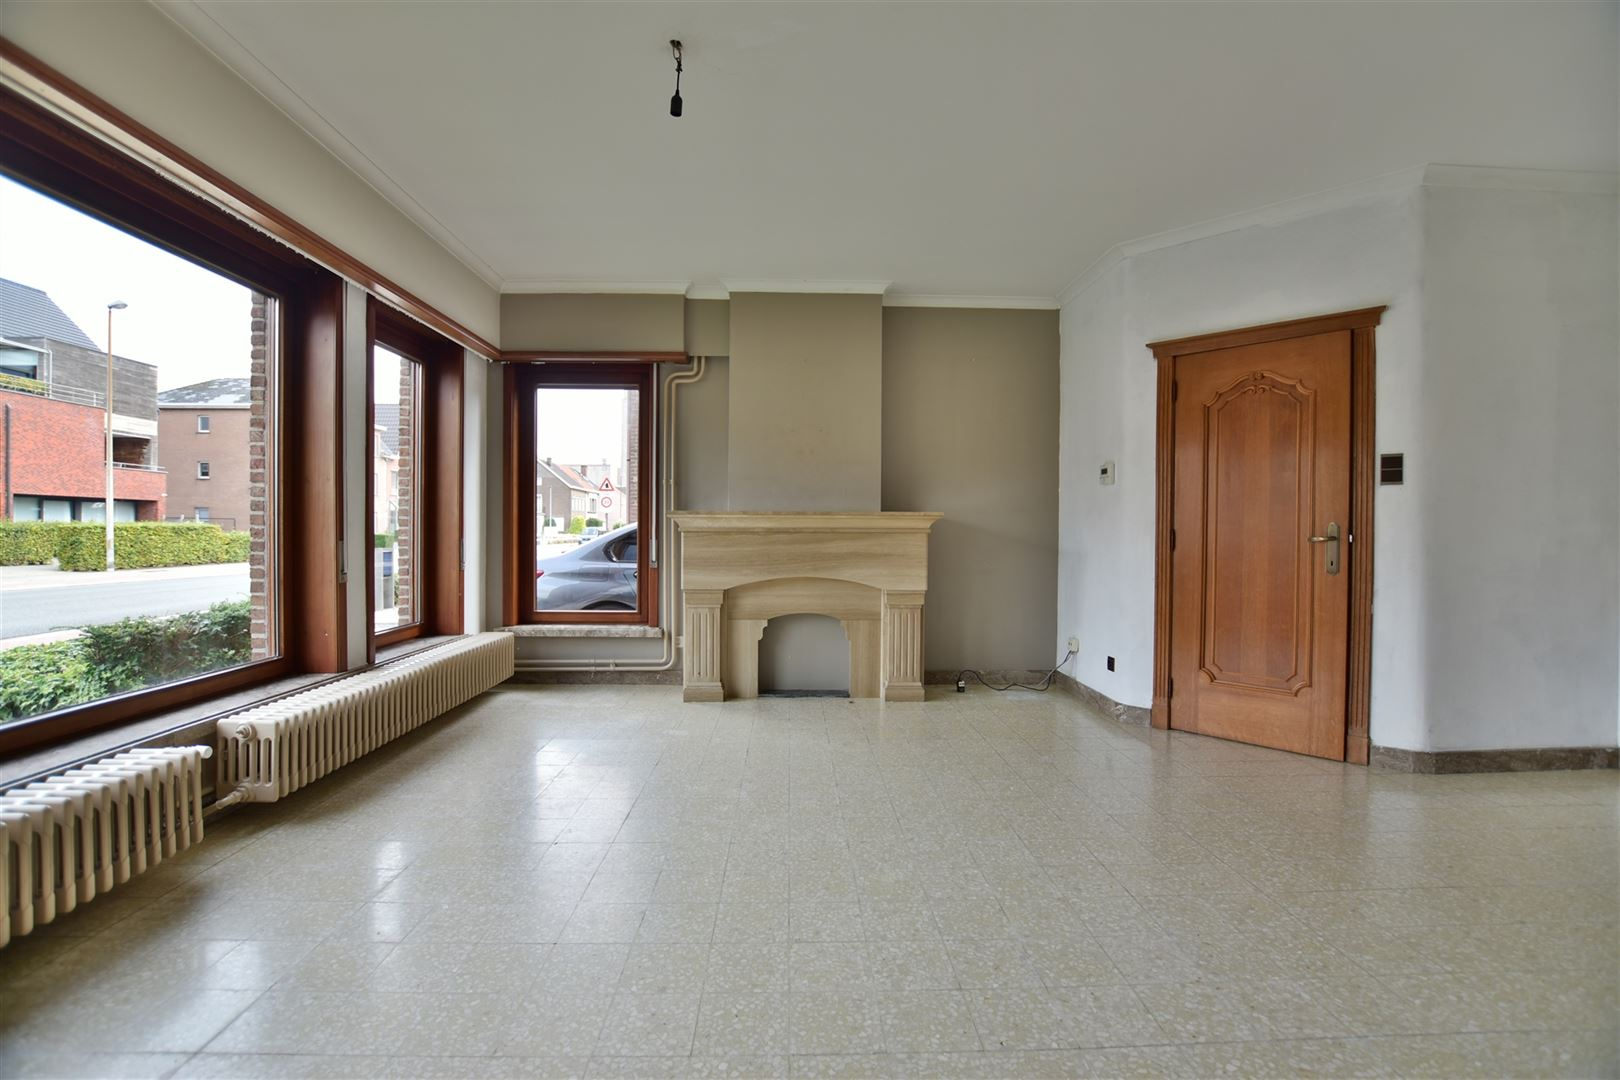 Foto 2 : Woning te 9100 SINT-NIKLAAS (België) - Prijs € 349.000